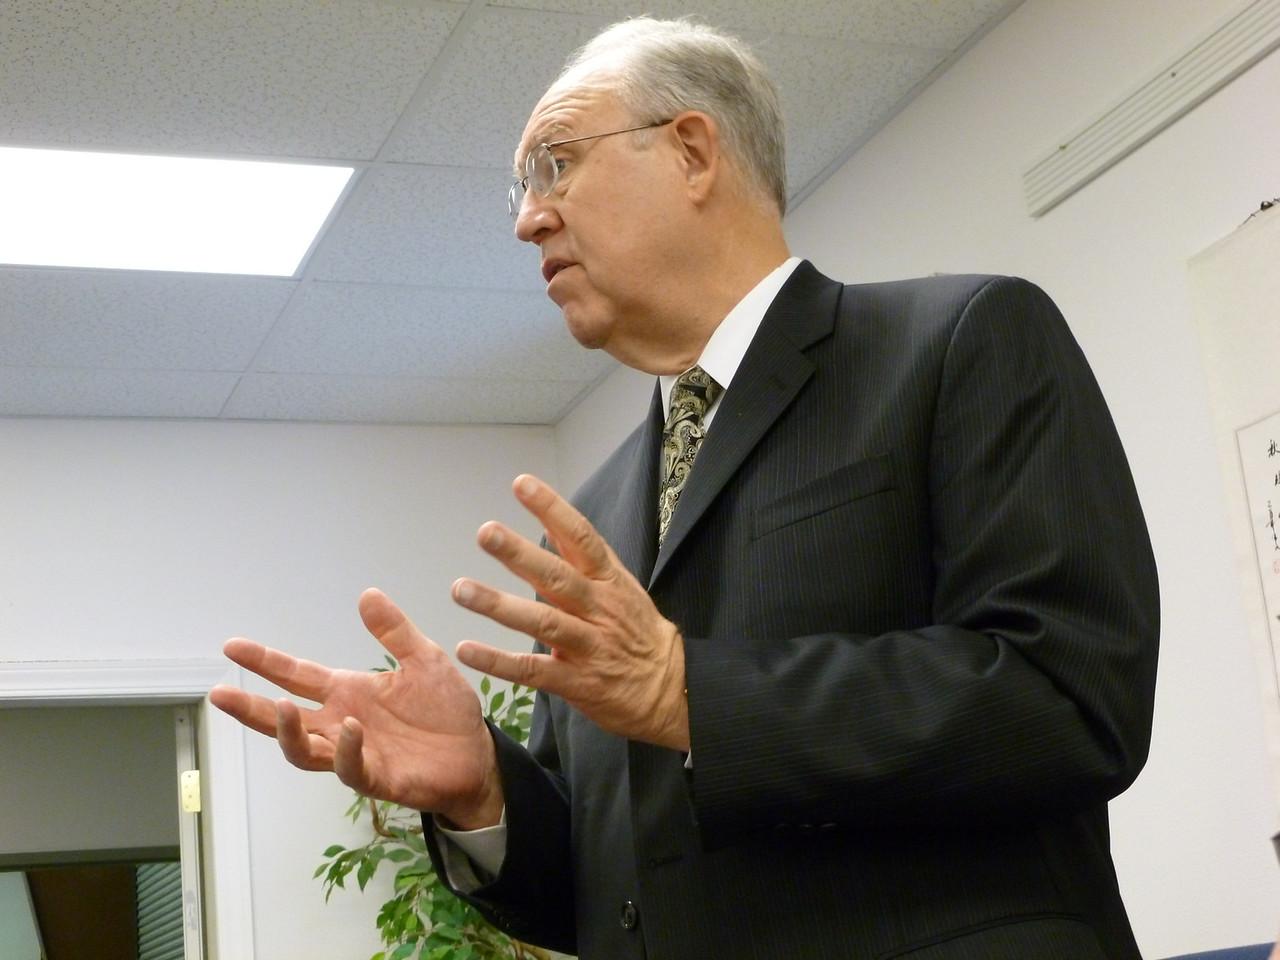 Dr. Larry Evans, General Conference of SDA Liaison for Deaf Ministry